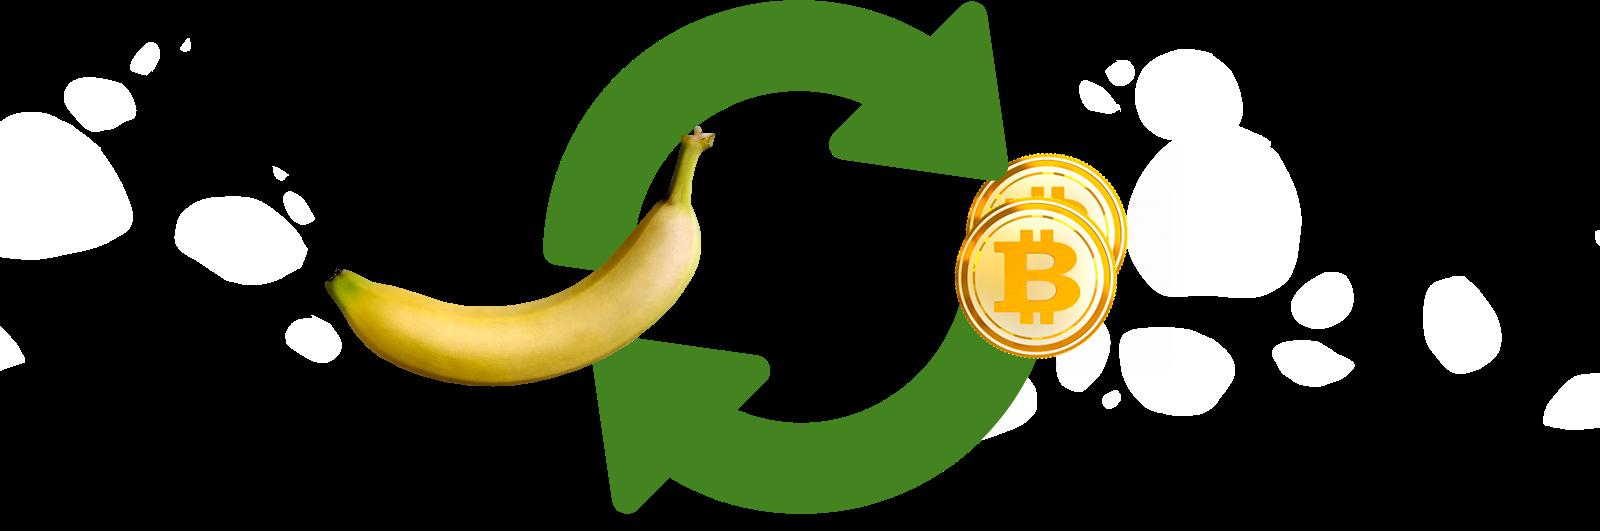 1 banana = 2 monedas